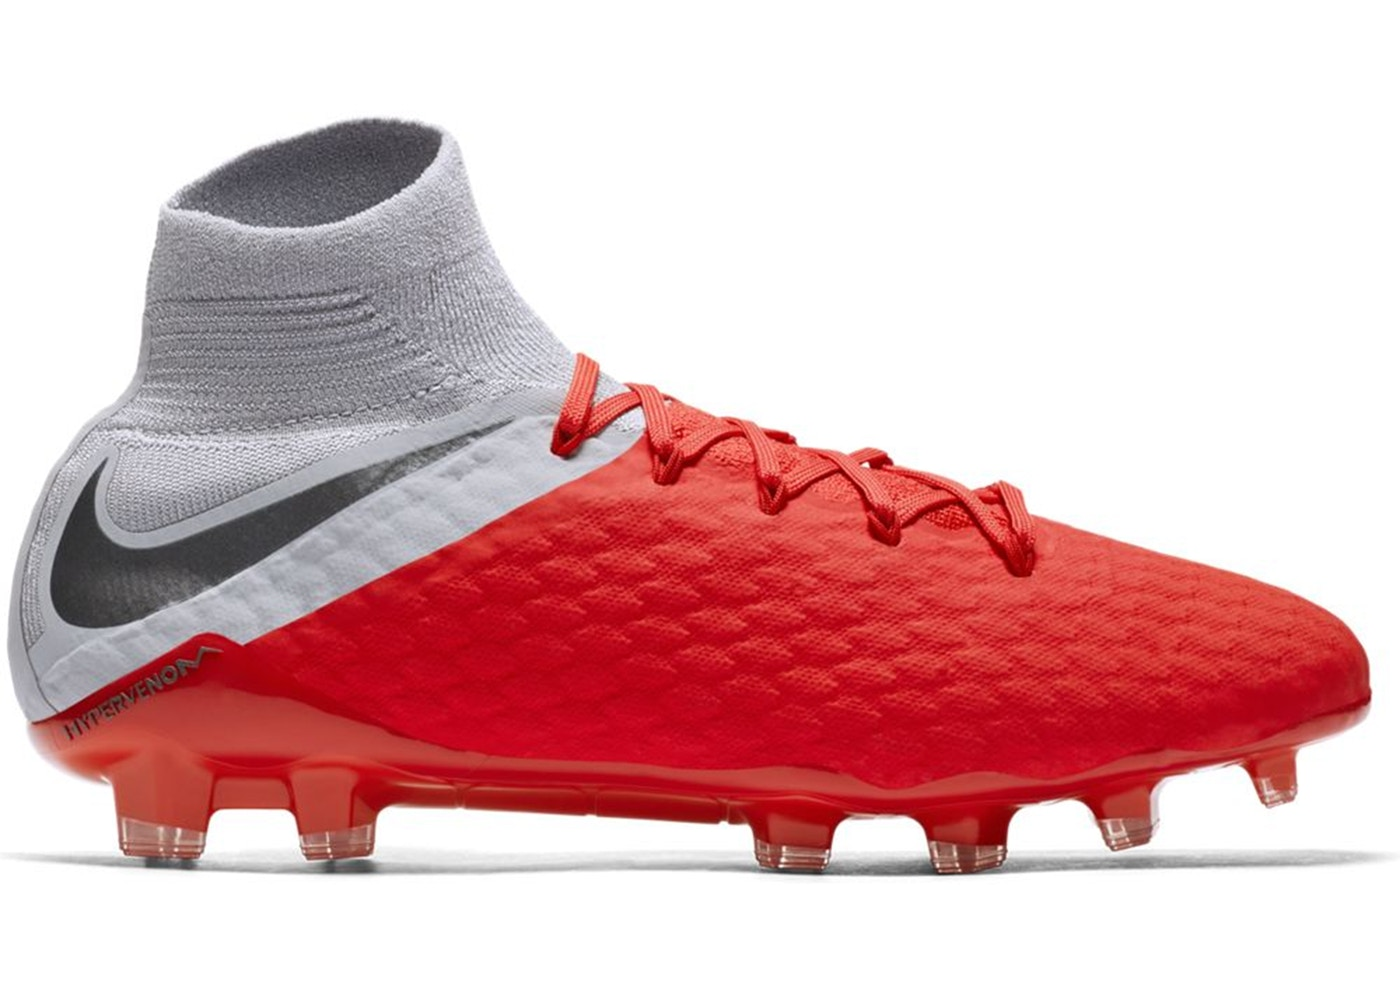 new product e946d be09b Nike Hypervenom Phantom 3 Pro DF FG Light Crimson Wolf Grey